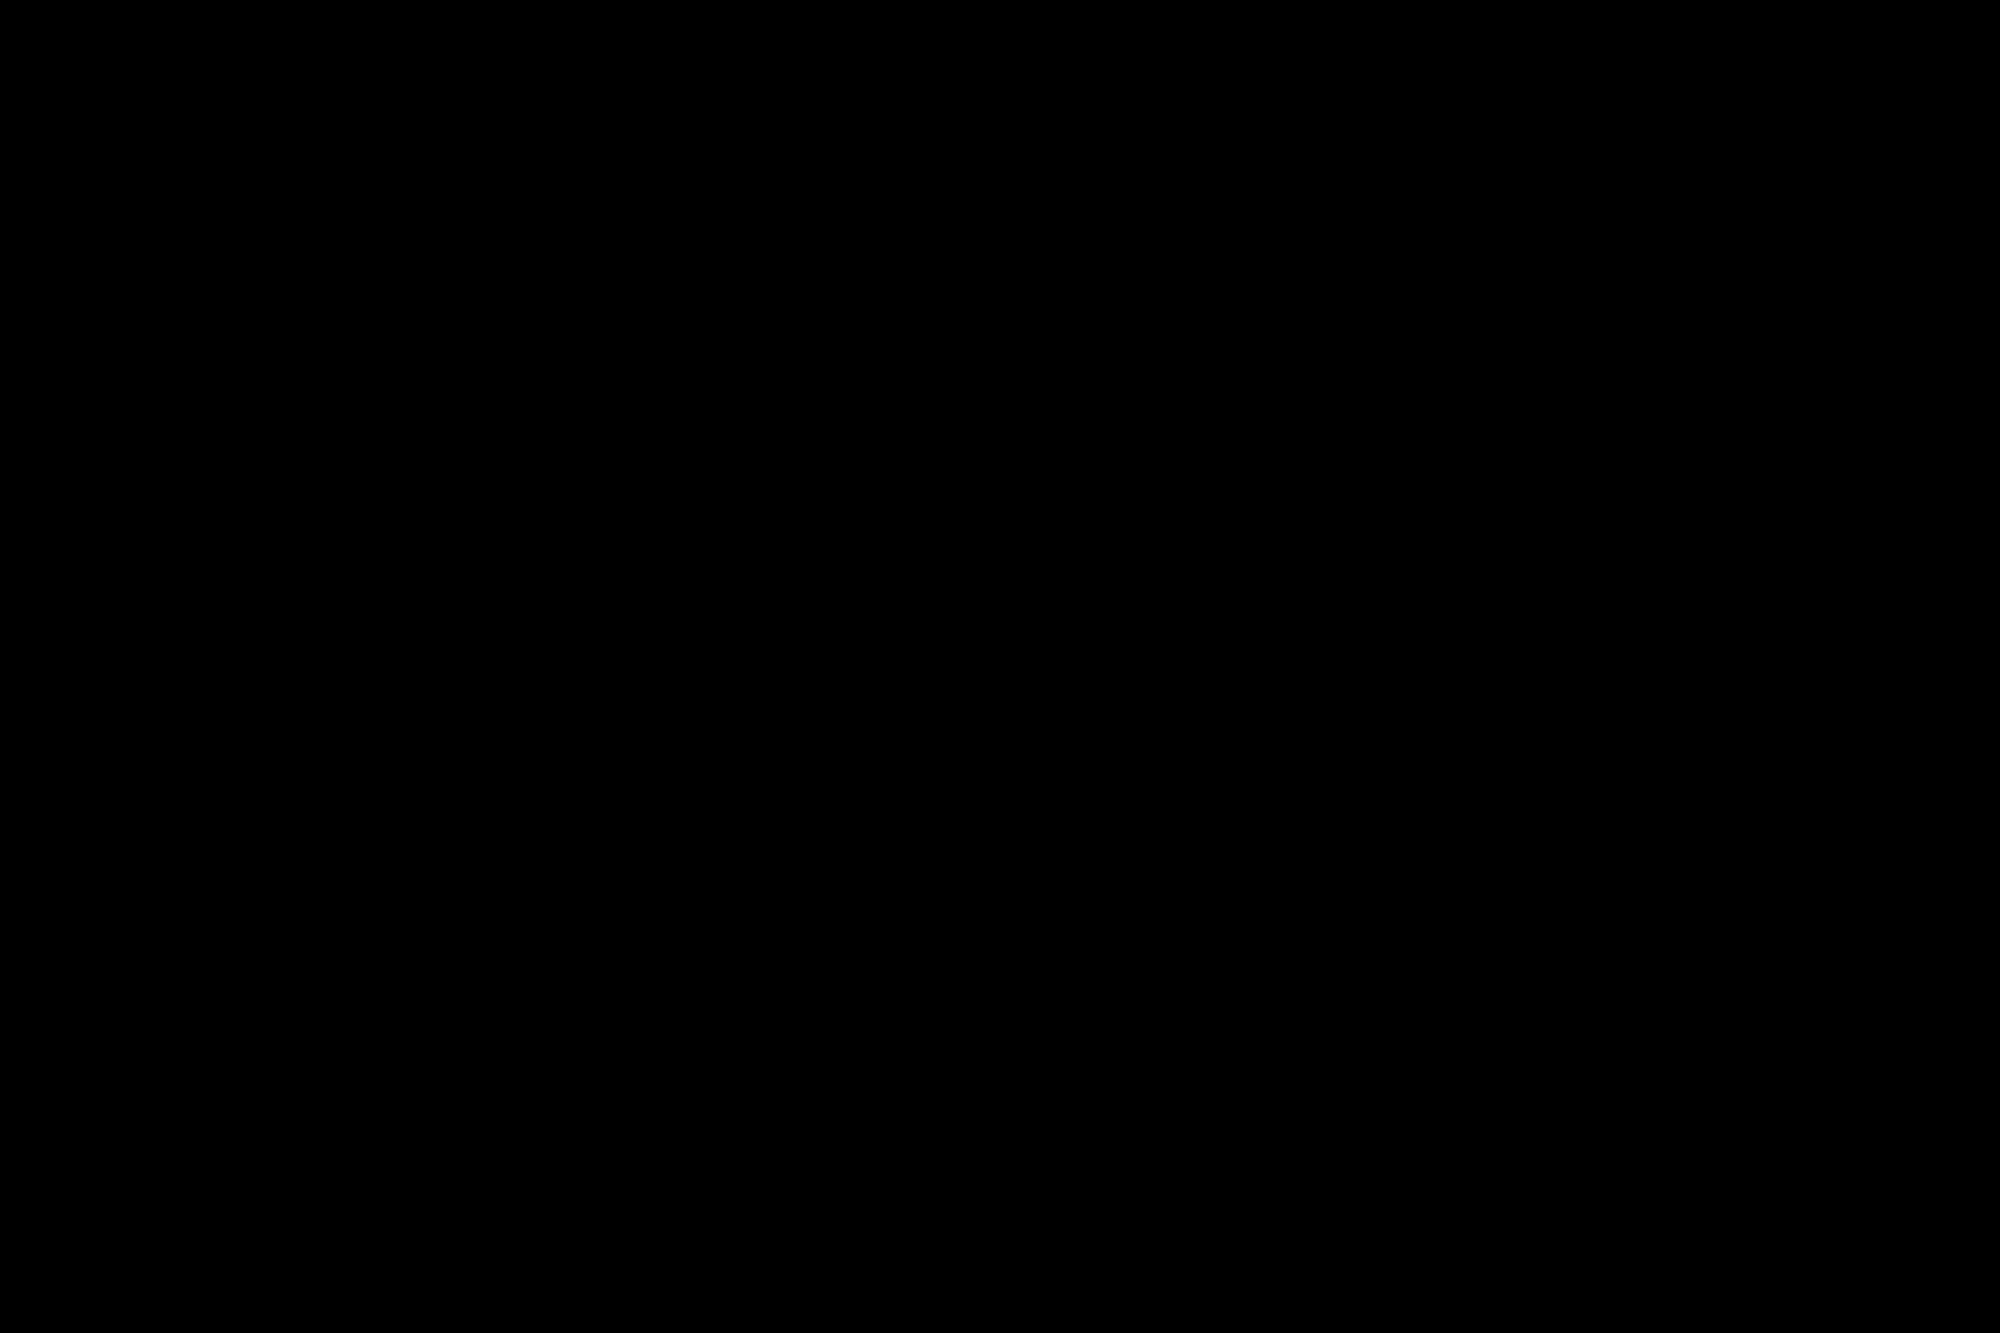 File black svg wikimedia. Oval clipart ellipse